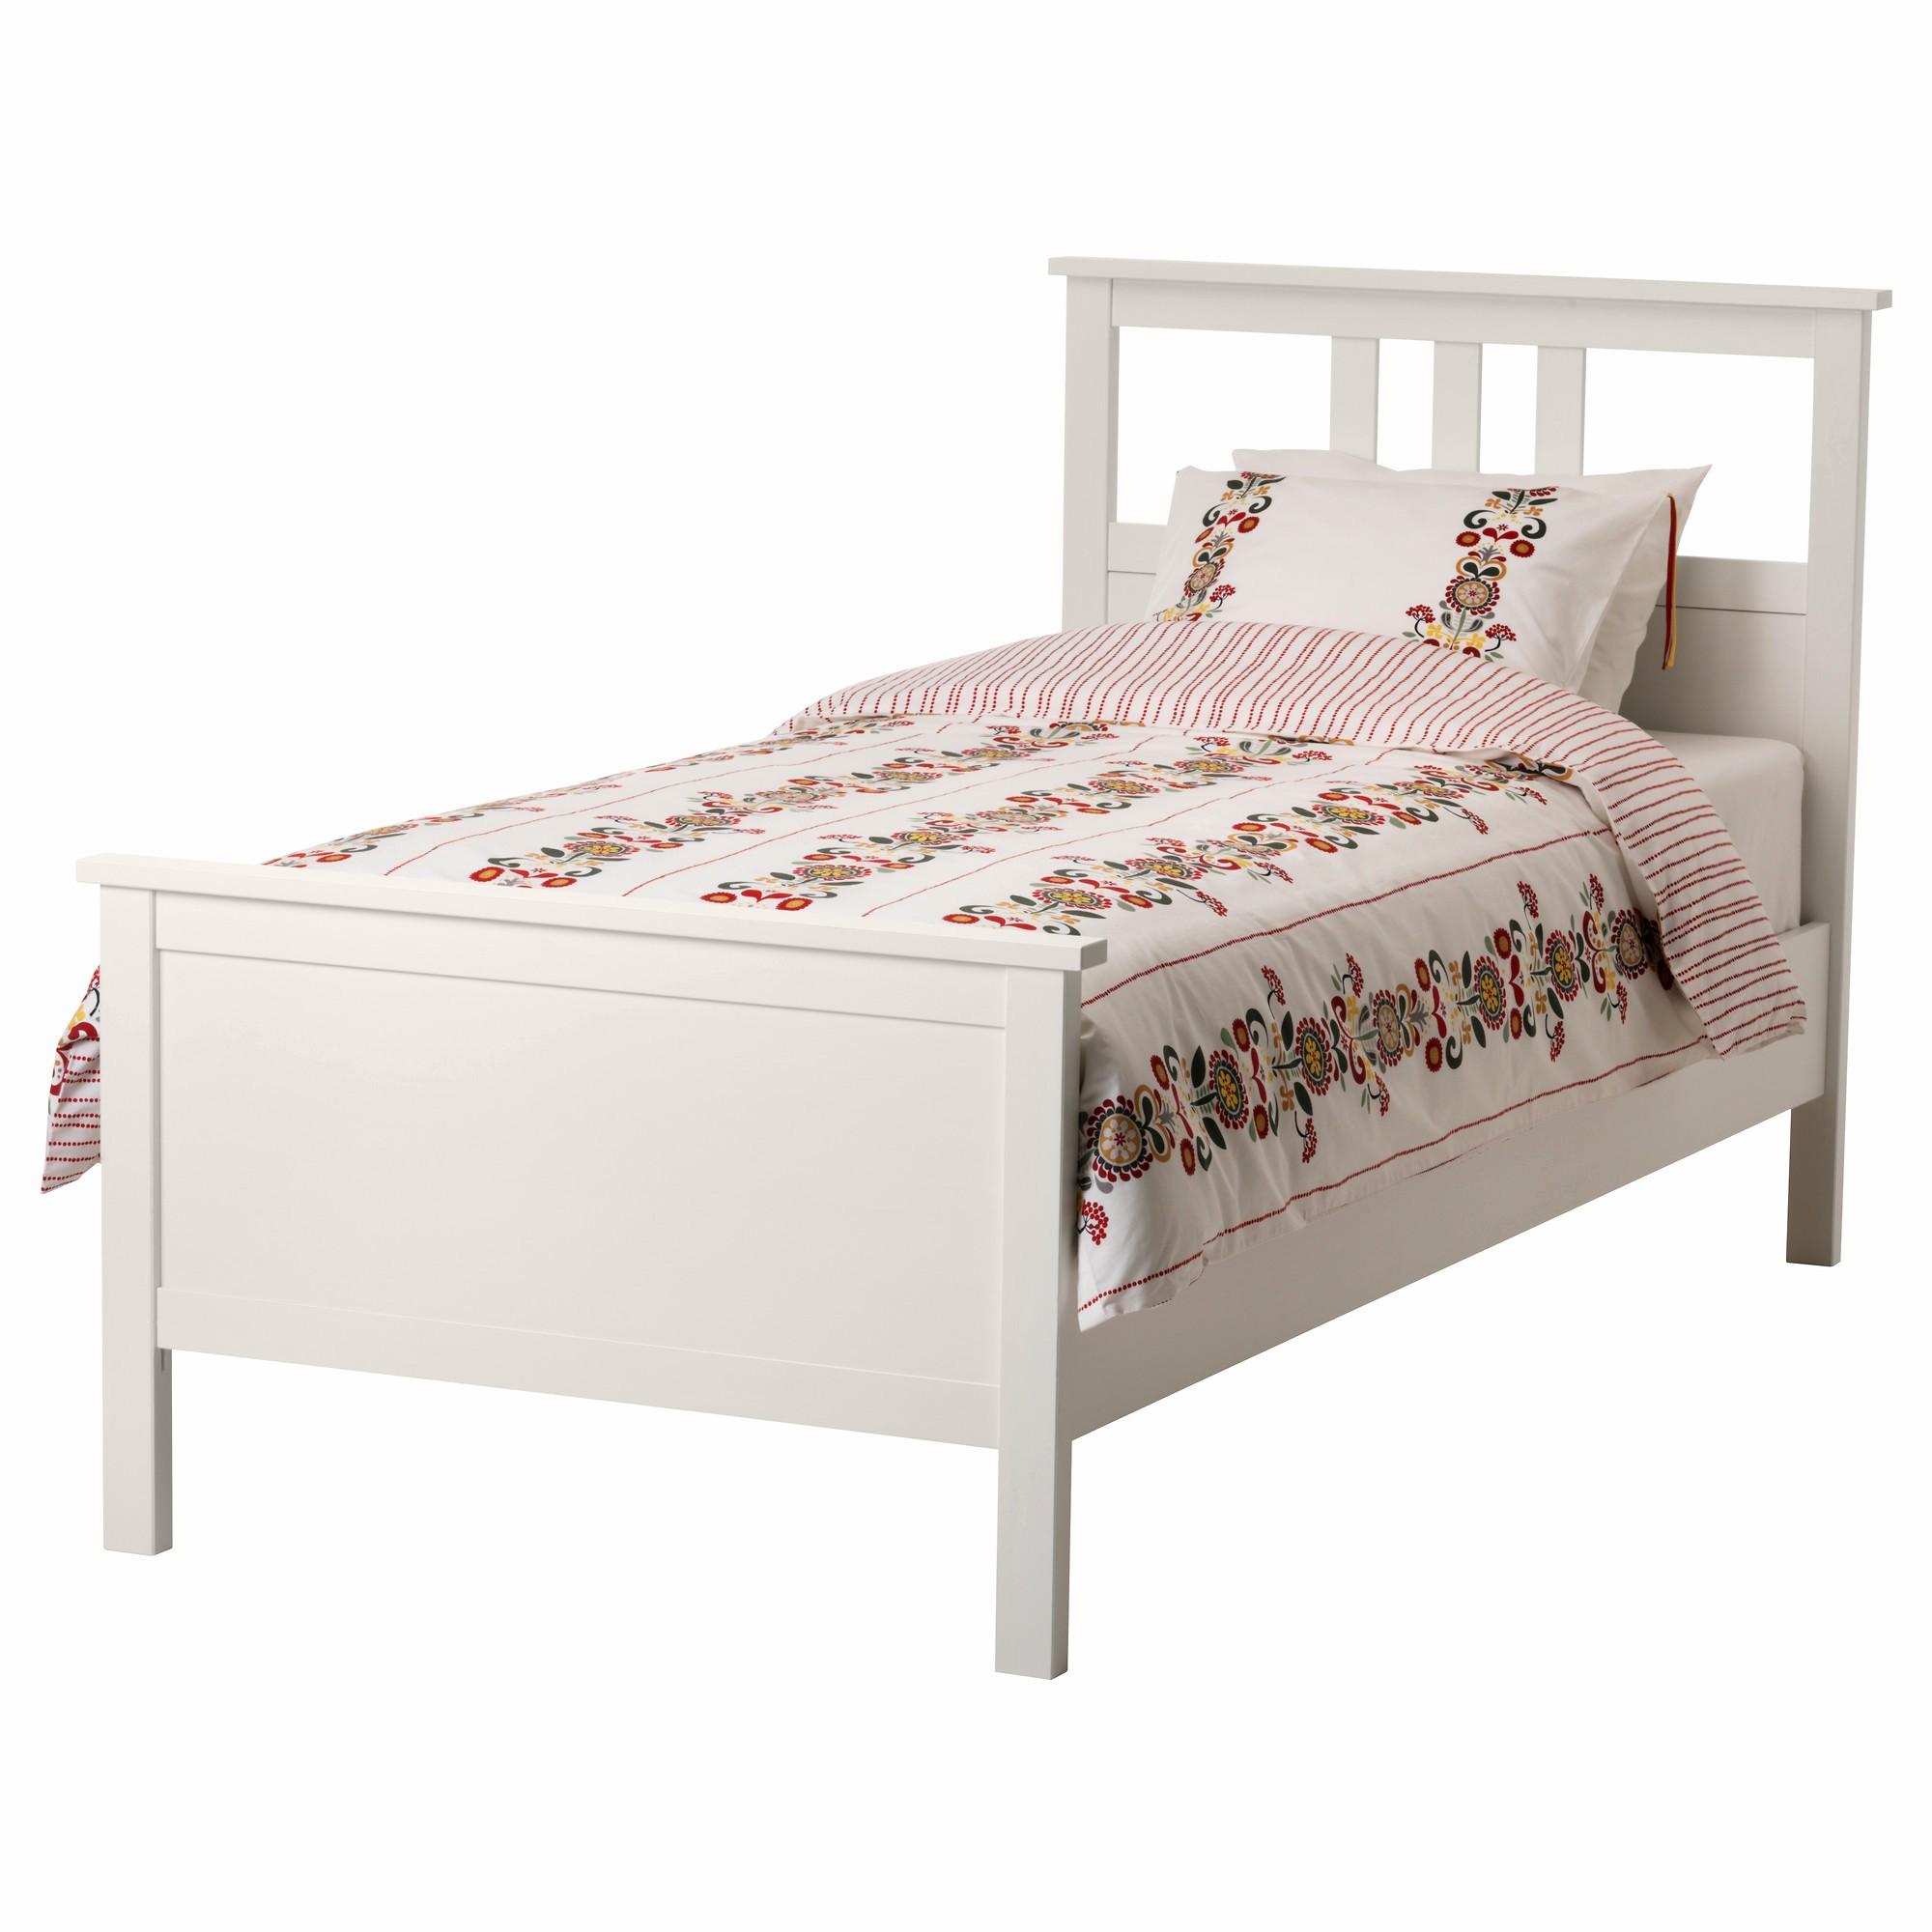 Full Size of Bett 120x200 Ikea Betten 90x200 Wei 140a200 Wildeichen Malm Birke Schutzgitter 140 X 200 Mit Unterbett Platzsparend 1 40x2 00 Schubladen Düsseldorf Bock Wohnzimmer Bett 120x200 Ikea